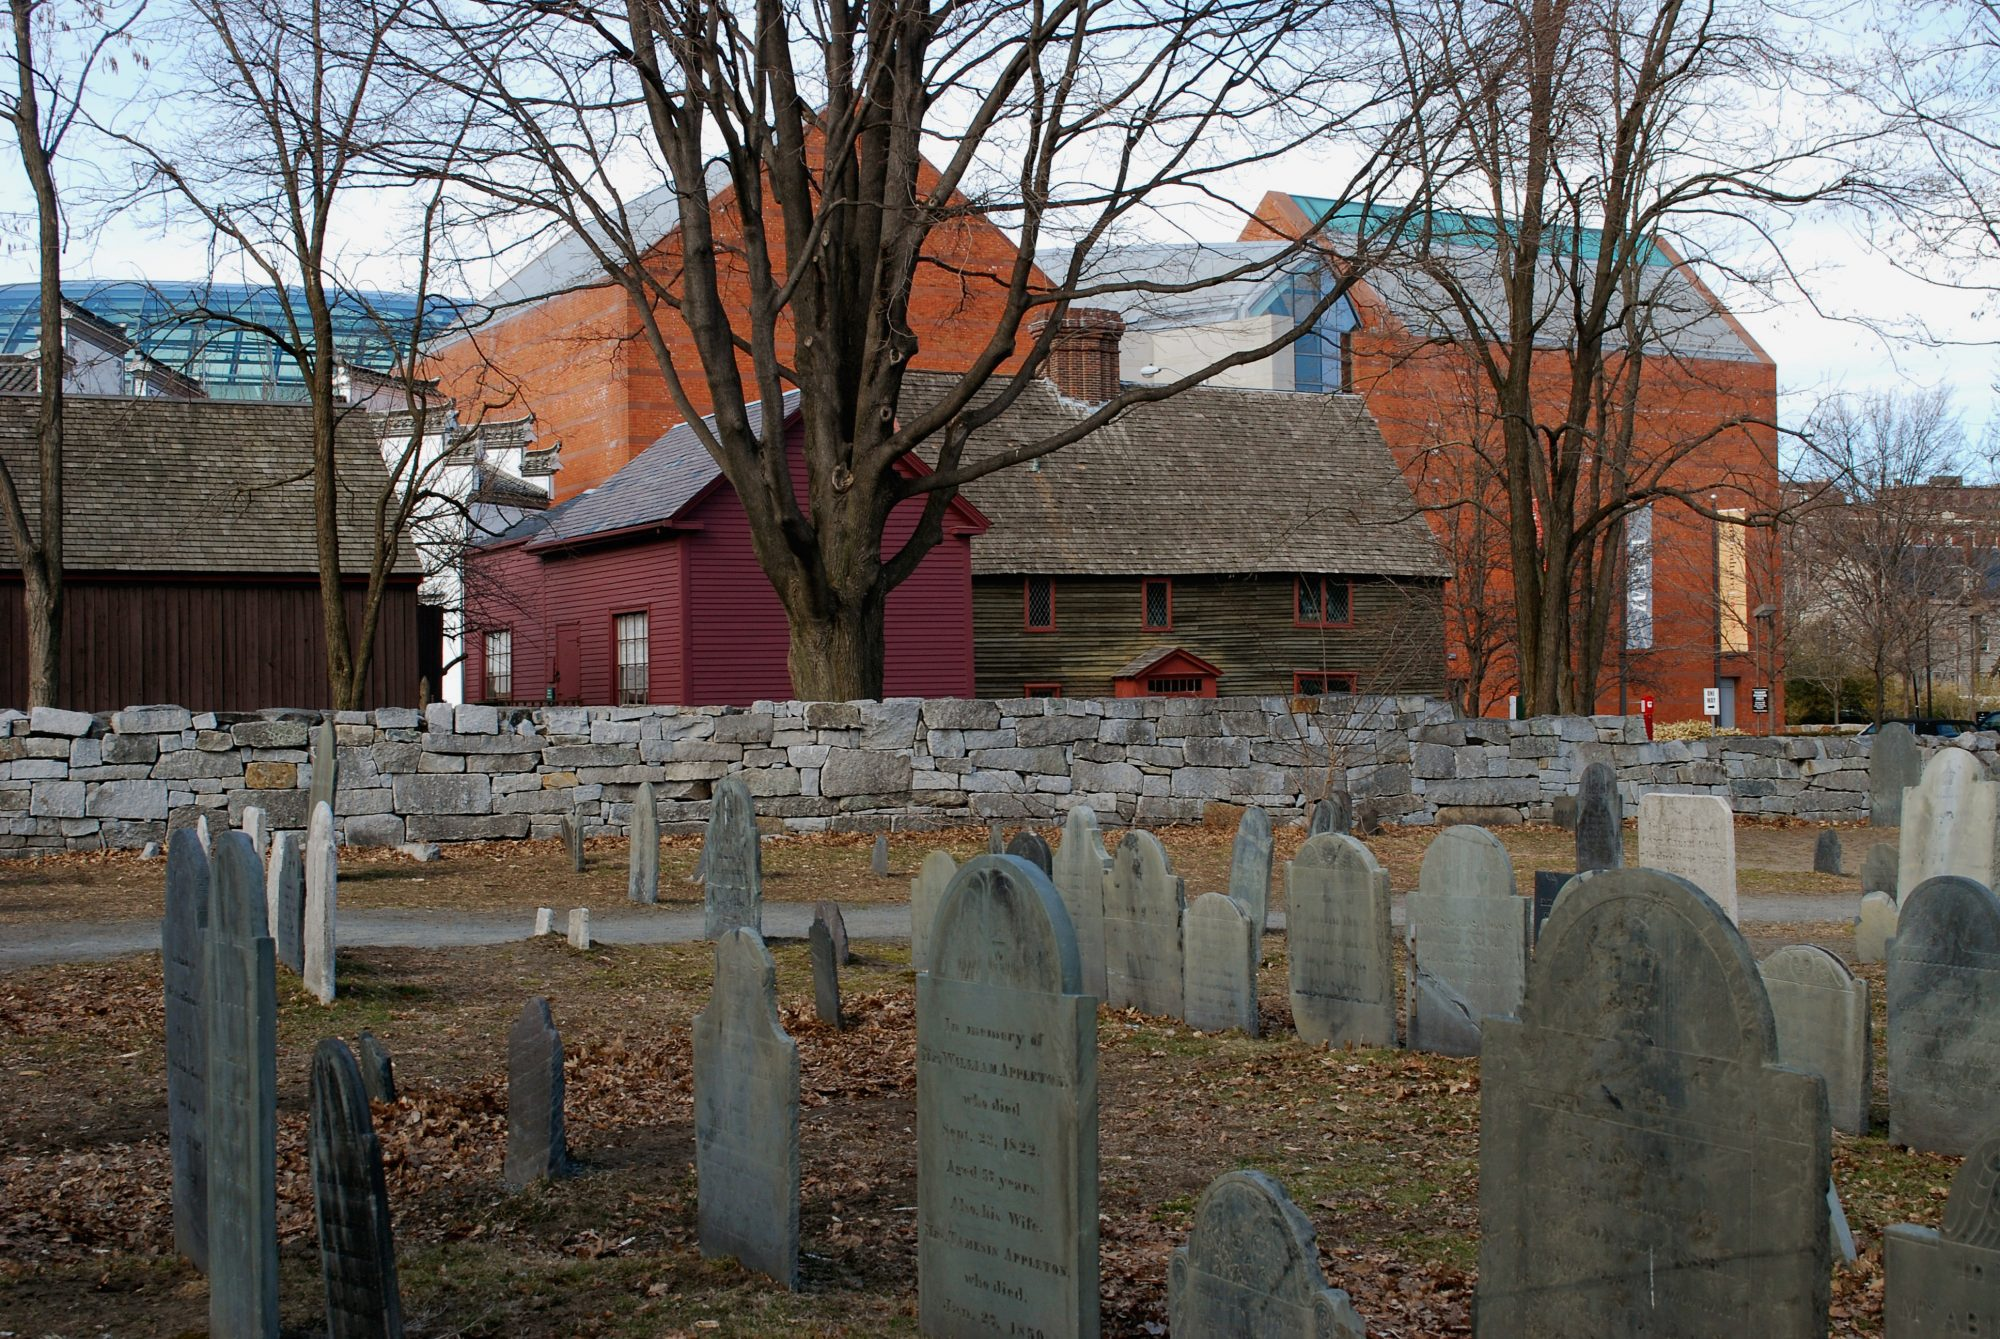 Charter Street Cemetery Salem MA